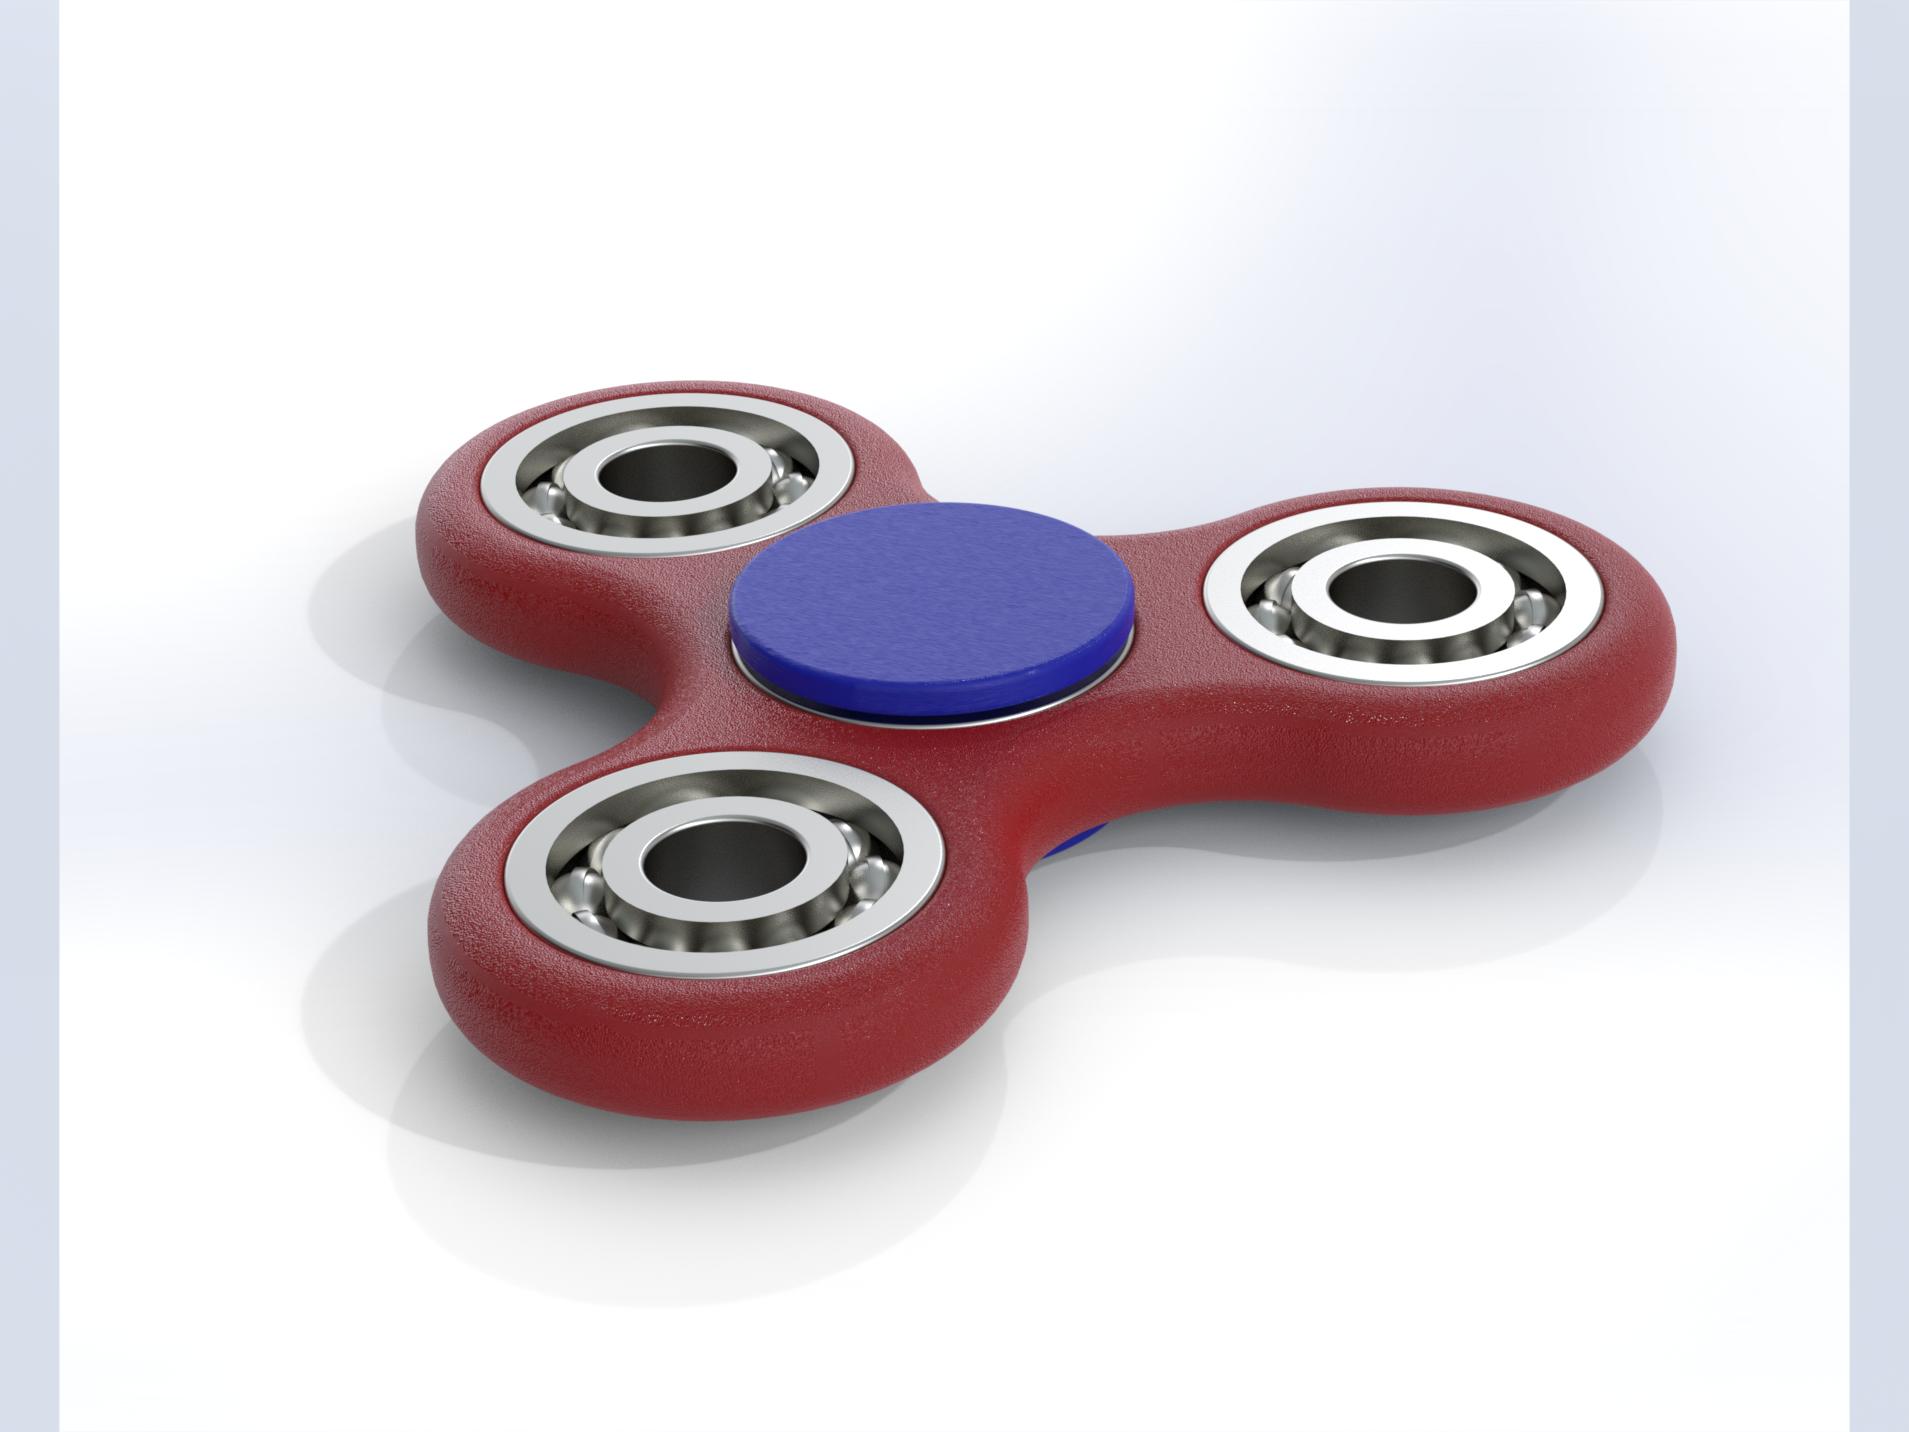 fidgetspinner solidworks